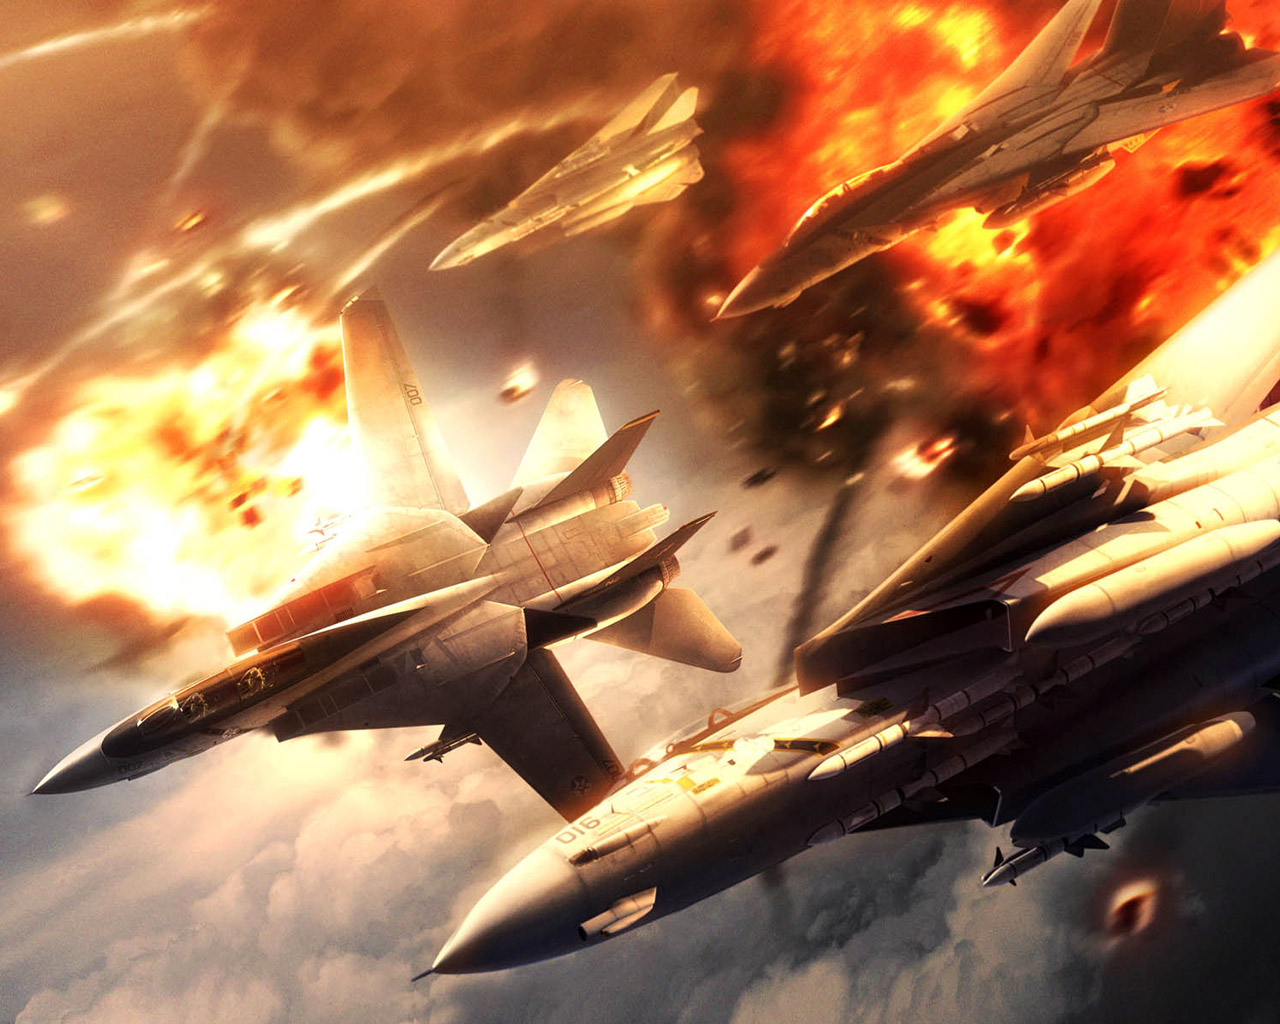 JetGetters, un shooter aéreo multijugador muestra su primer teaser [Indy games]